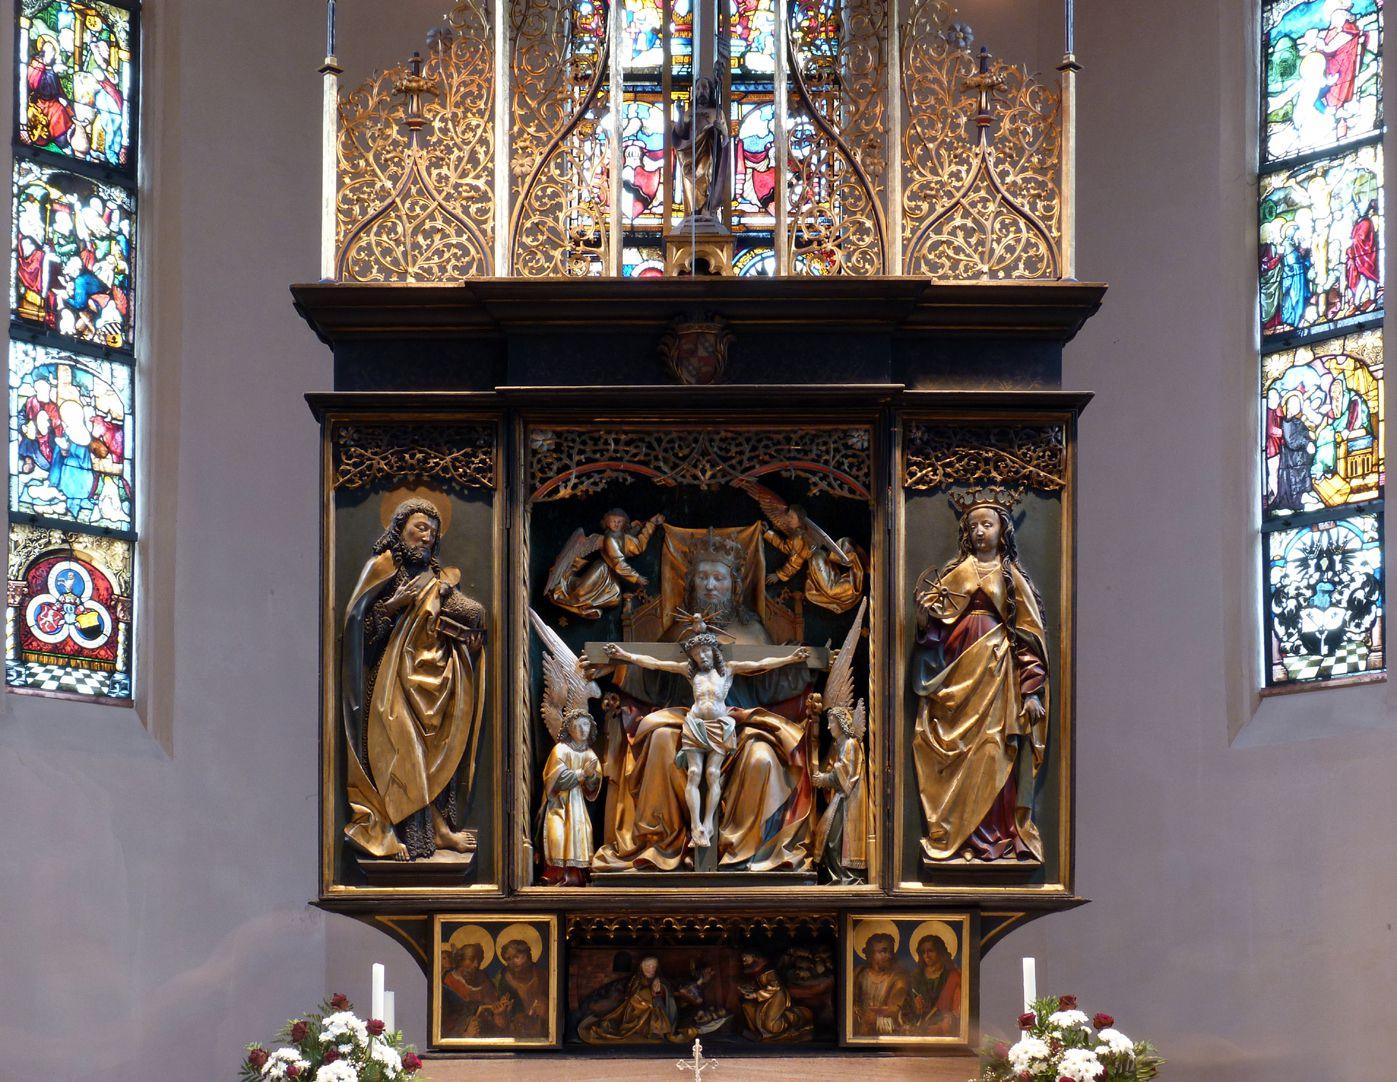 St. Bartholomäus, Hochaltar Gesamtansicht